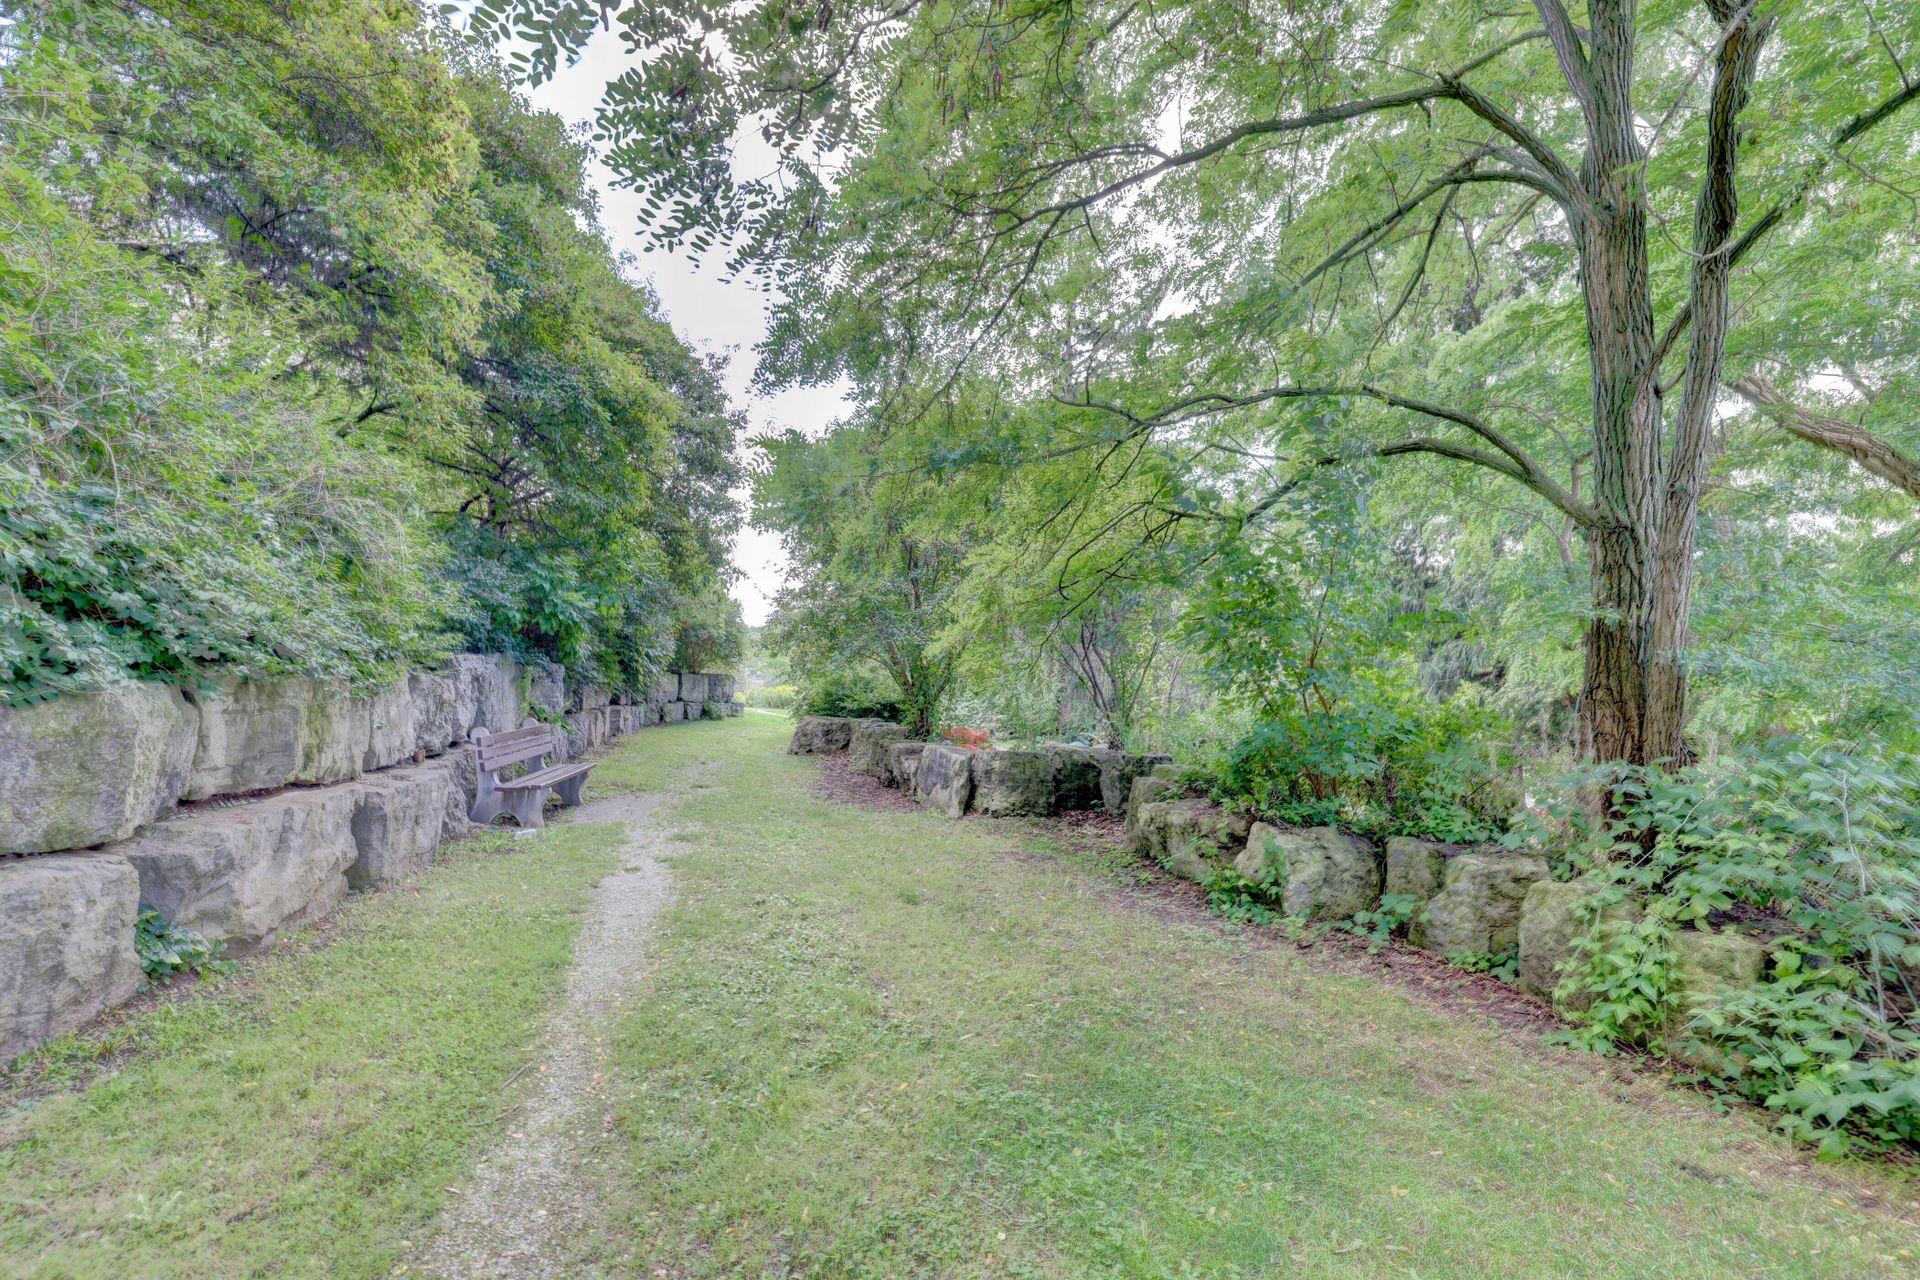 Paths & Trails at 403 - 2511 Lakeshore Road West, Bronte West, Oakville